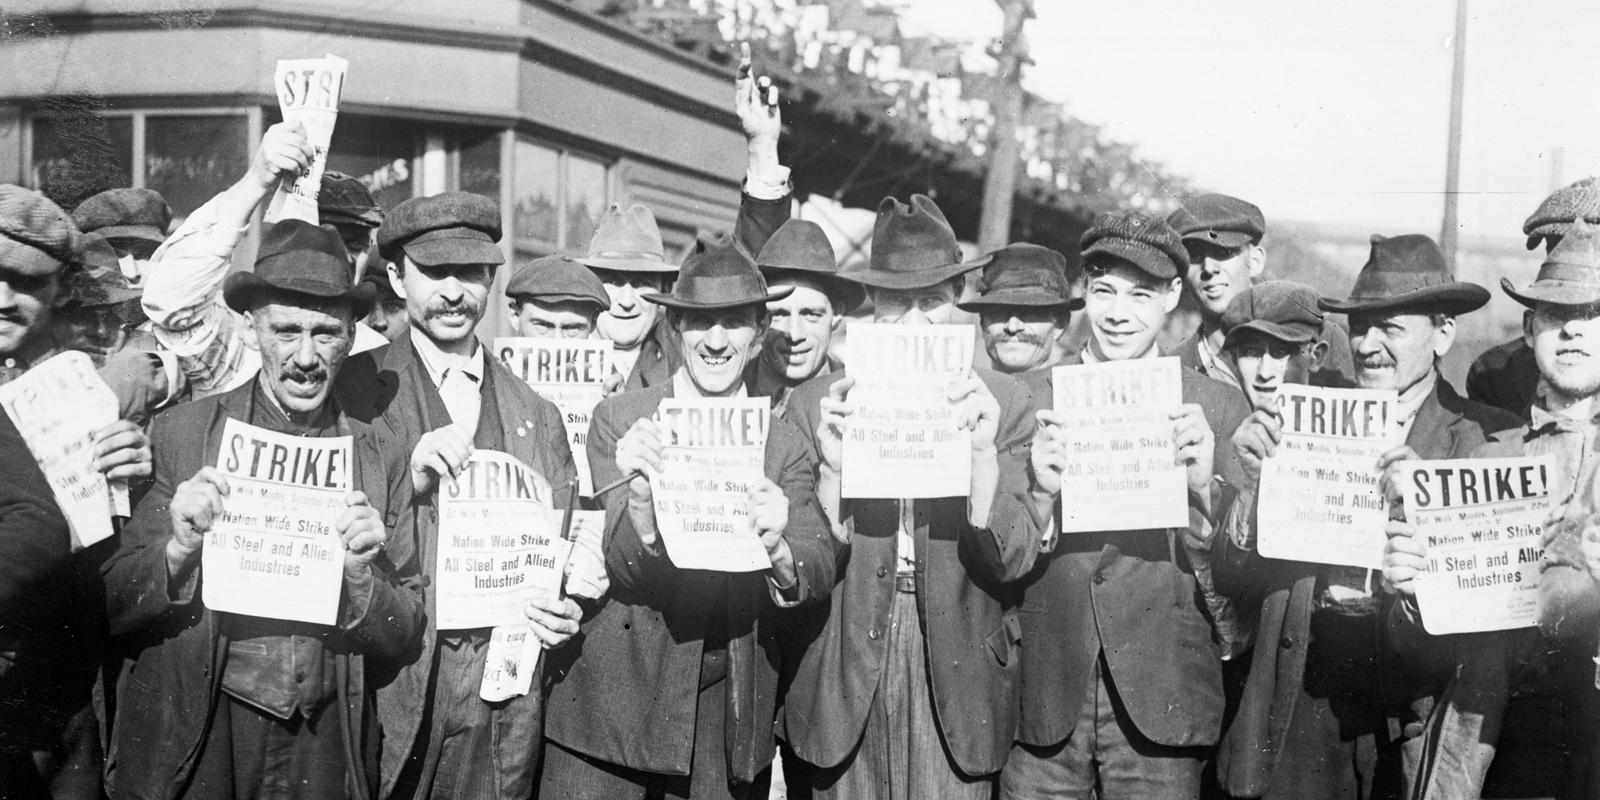 Striking steel mill workers holding bulletins, Chicago, Illinois, September 22, 1919. ExplorePAhistory.com